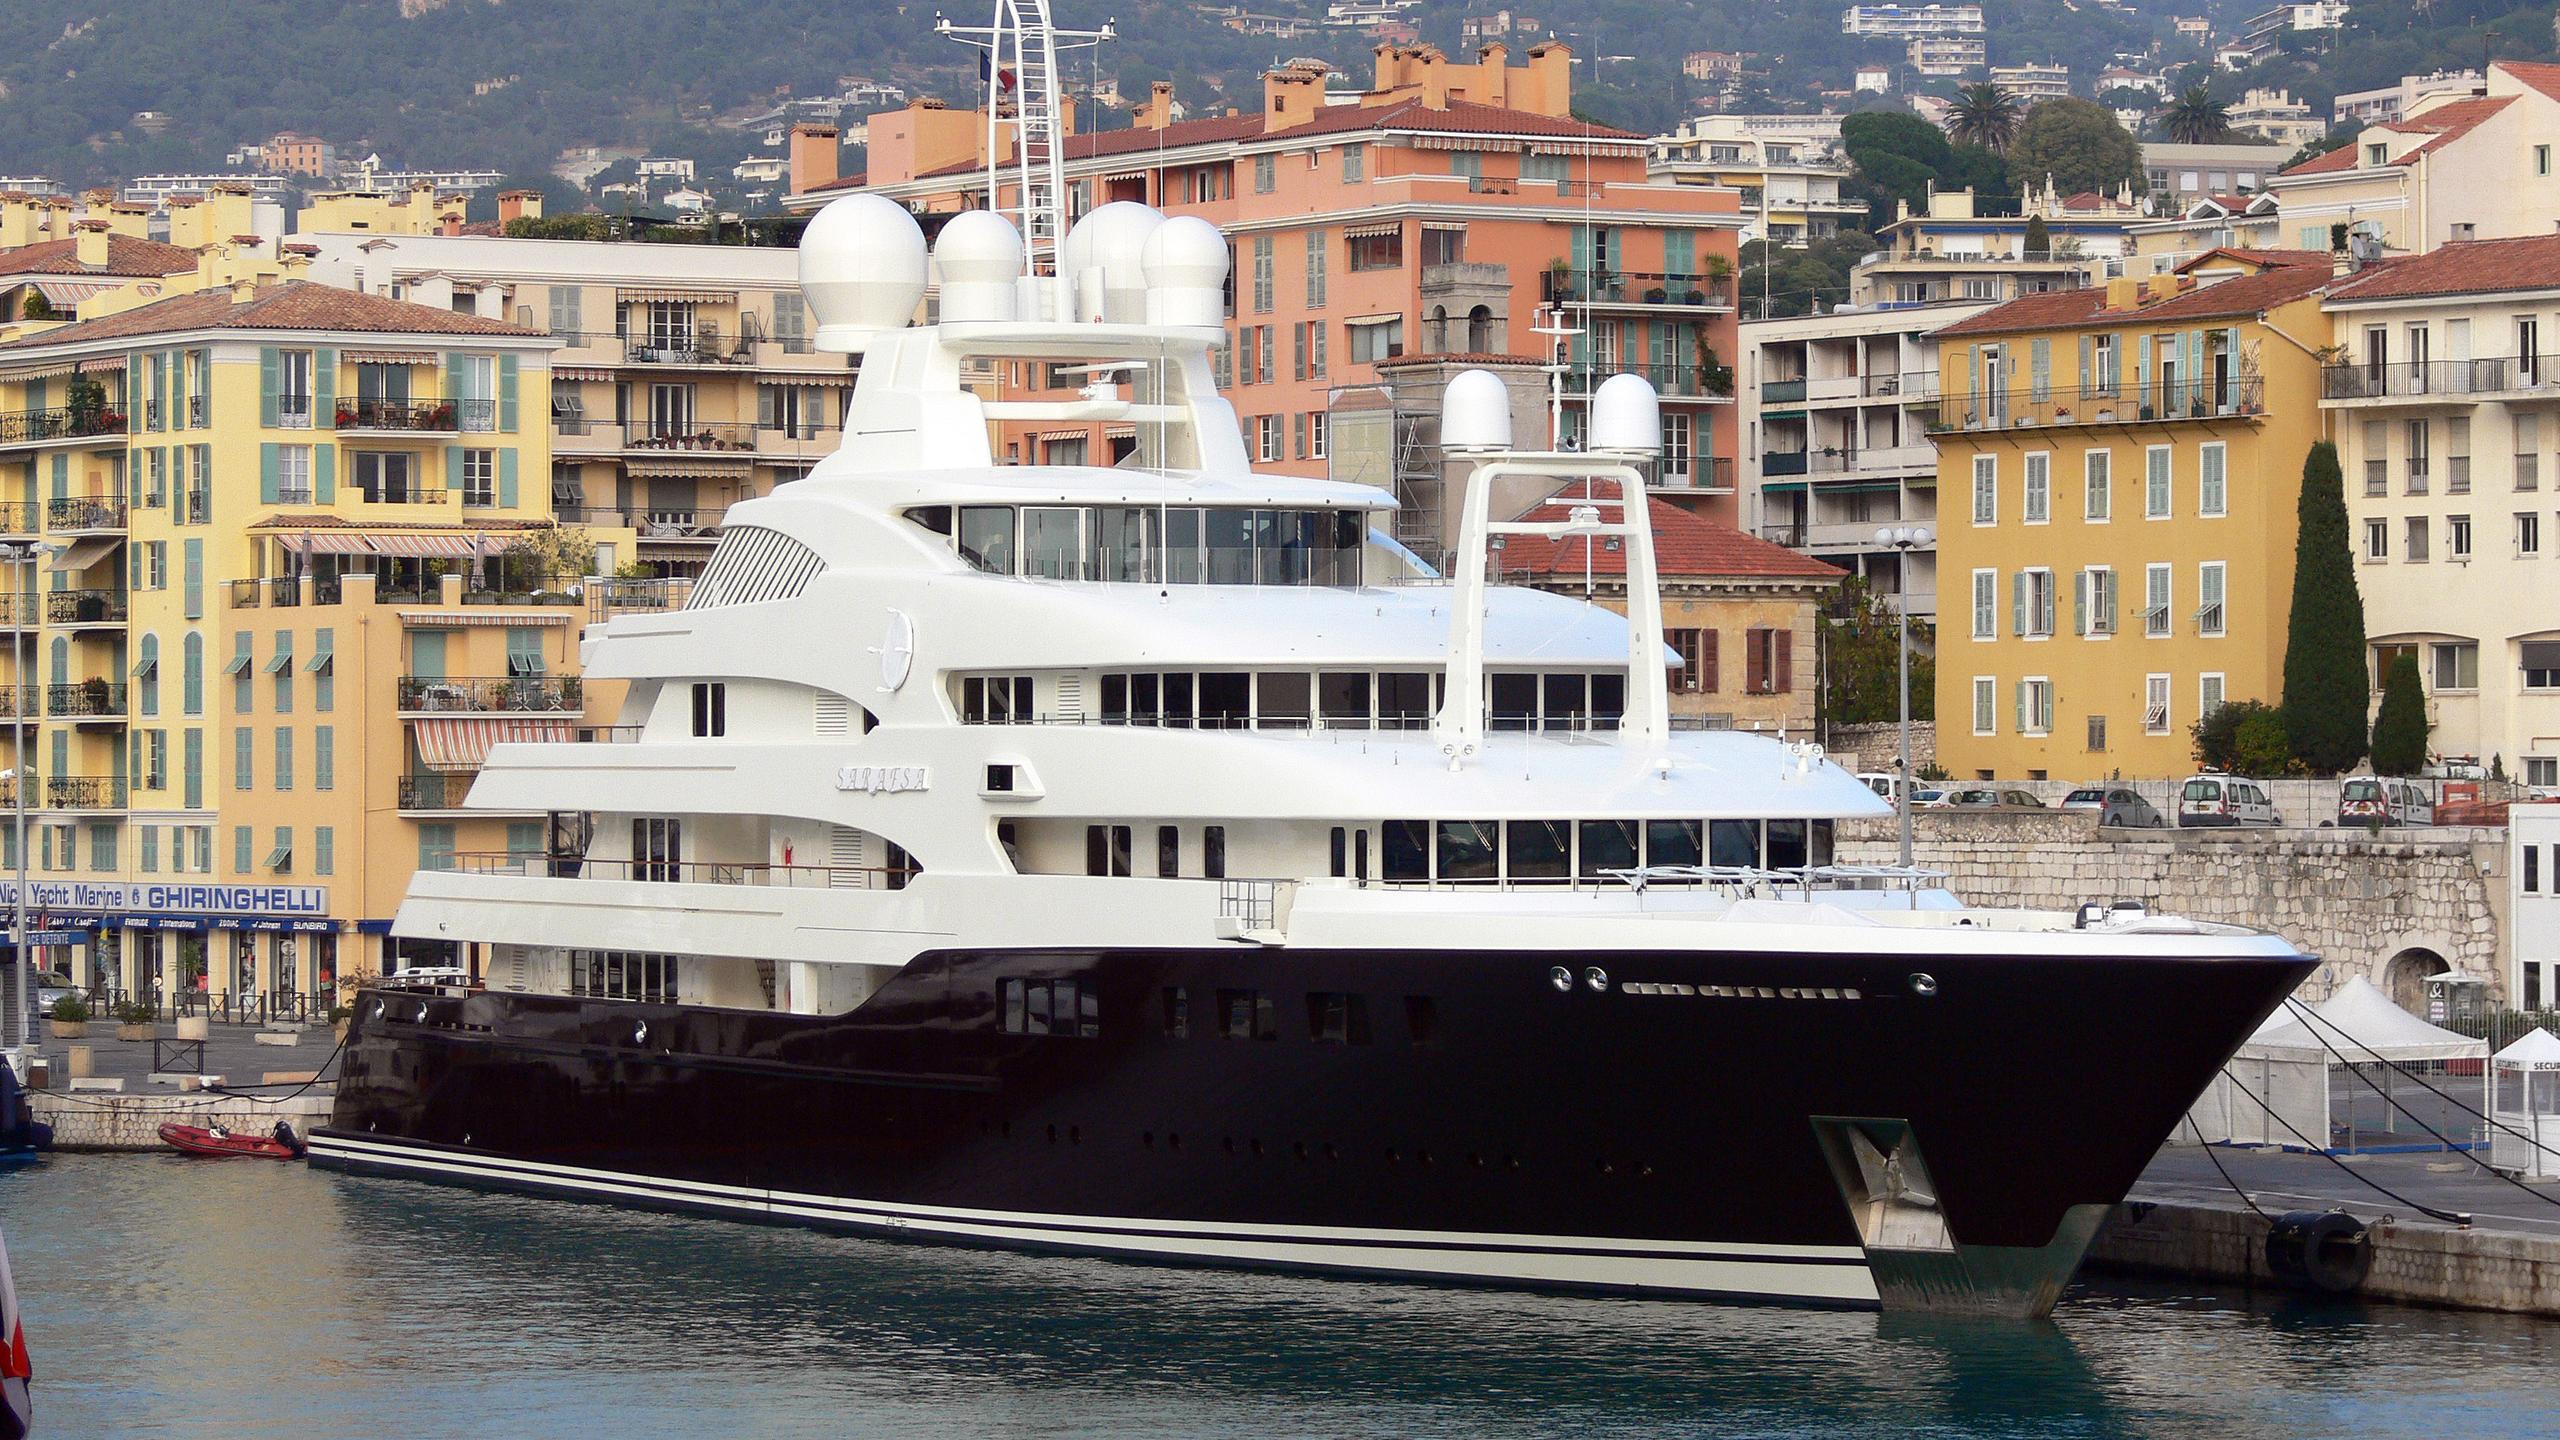 sarafsa-motor-yacht-devonport-2008-82m-half-profile